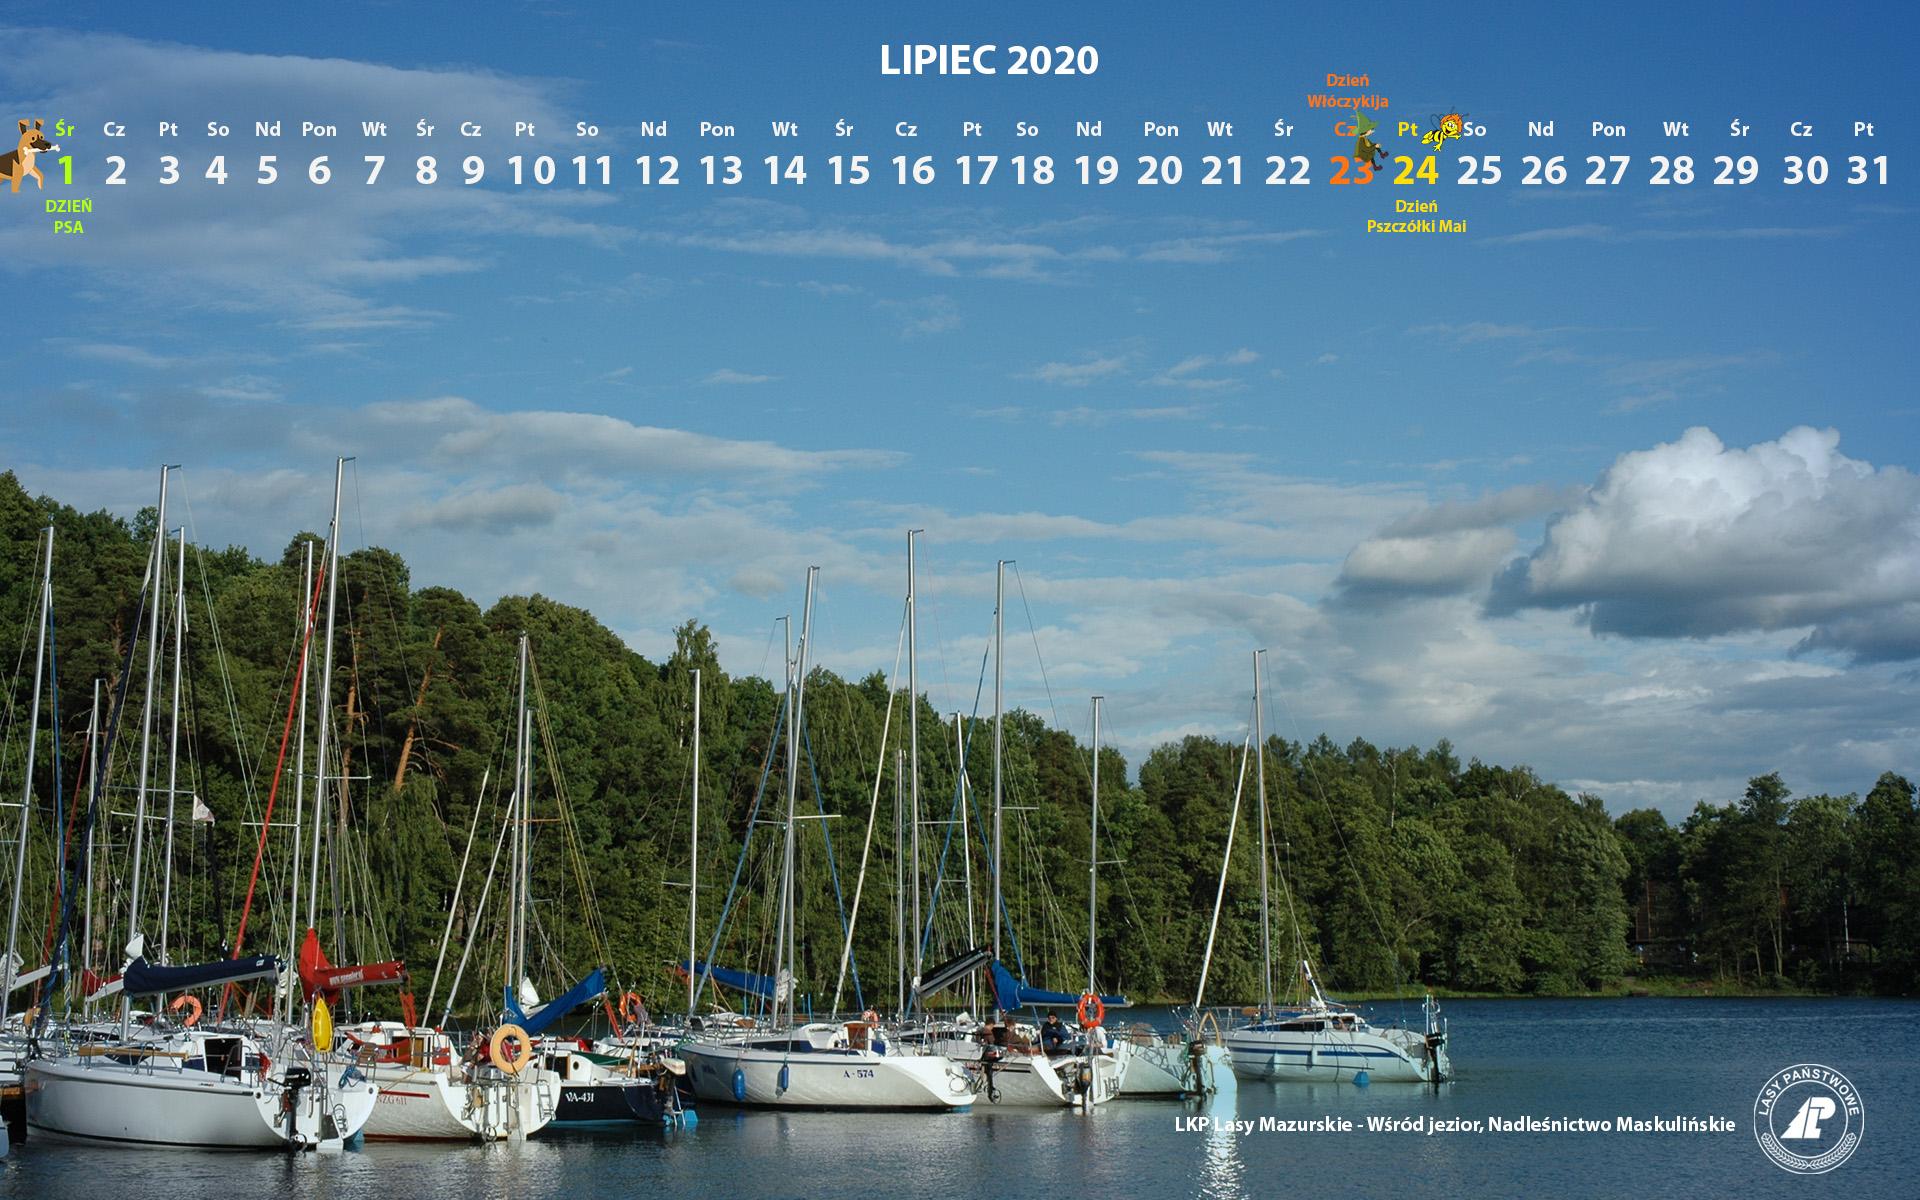 Kalendarz_lipiec_2020_1920x1200[1].jpg